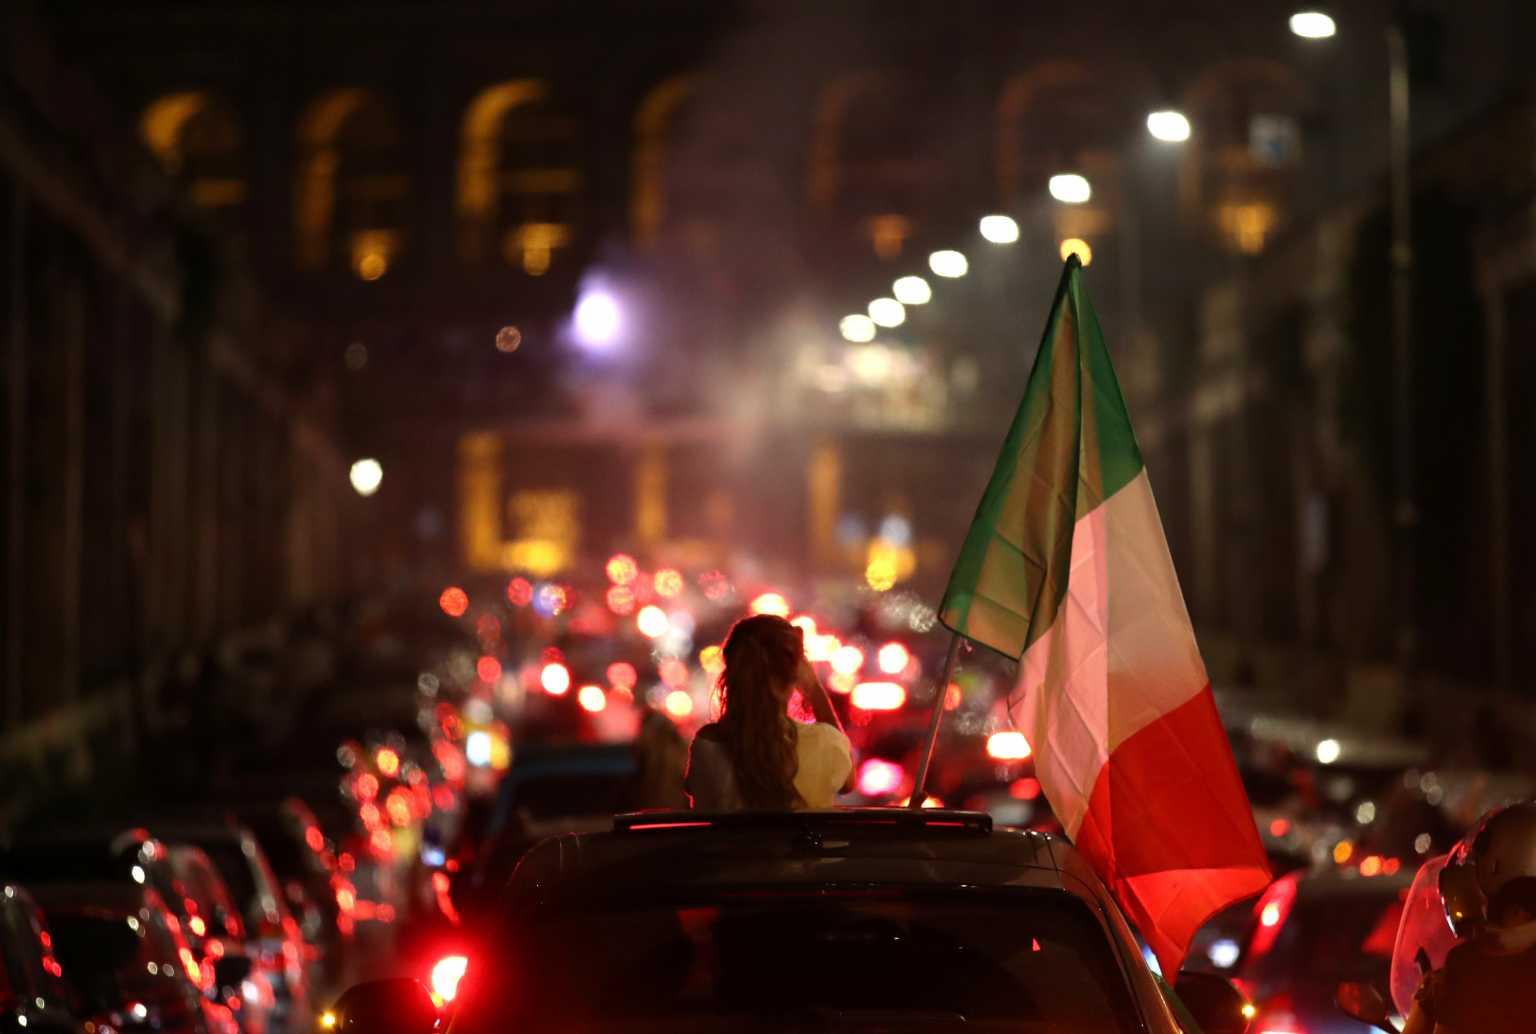 Euro 2020: Εκτέλεση συμβολαίου θανάτου εν μέσω πανηγυρισμών στην Ιταλία